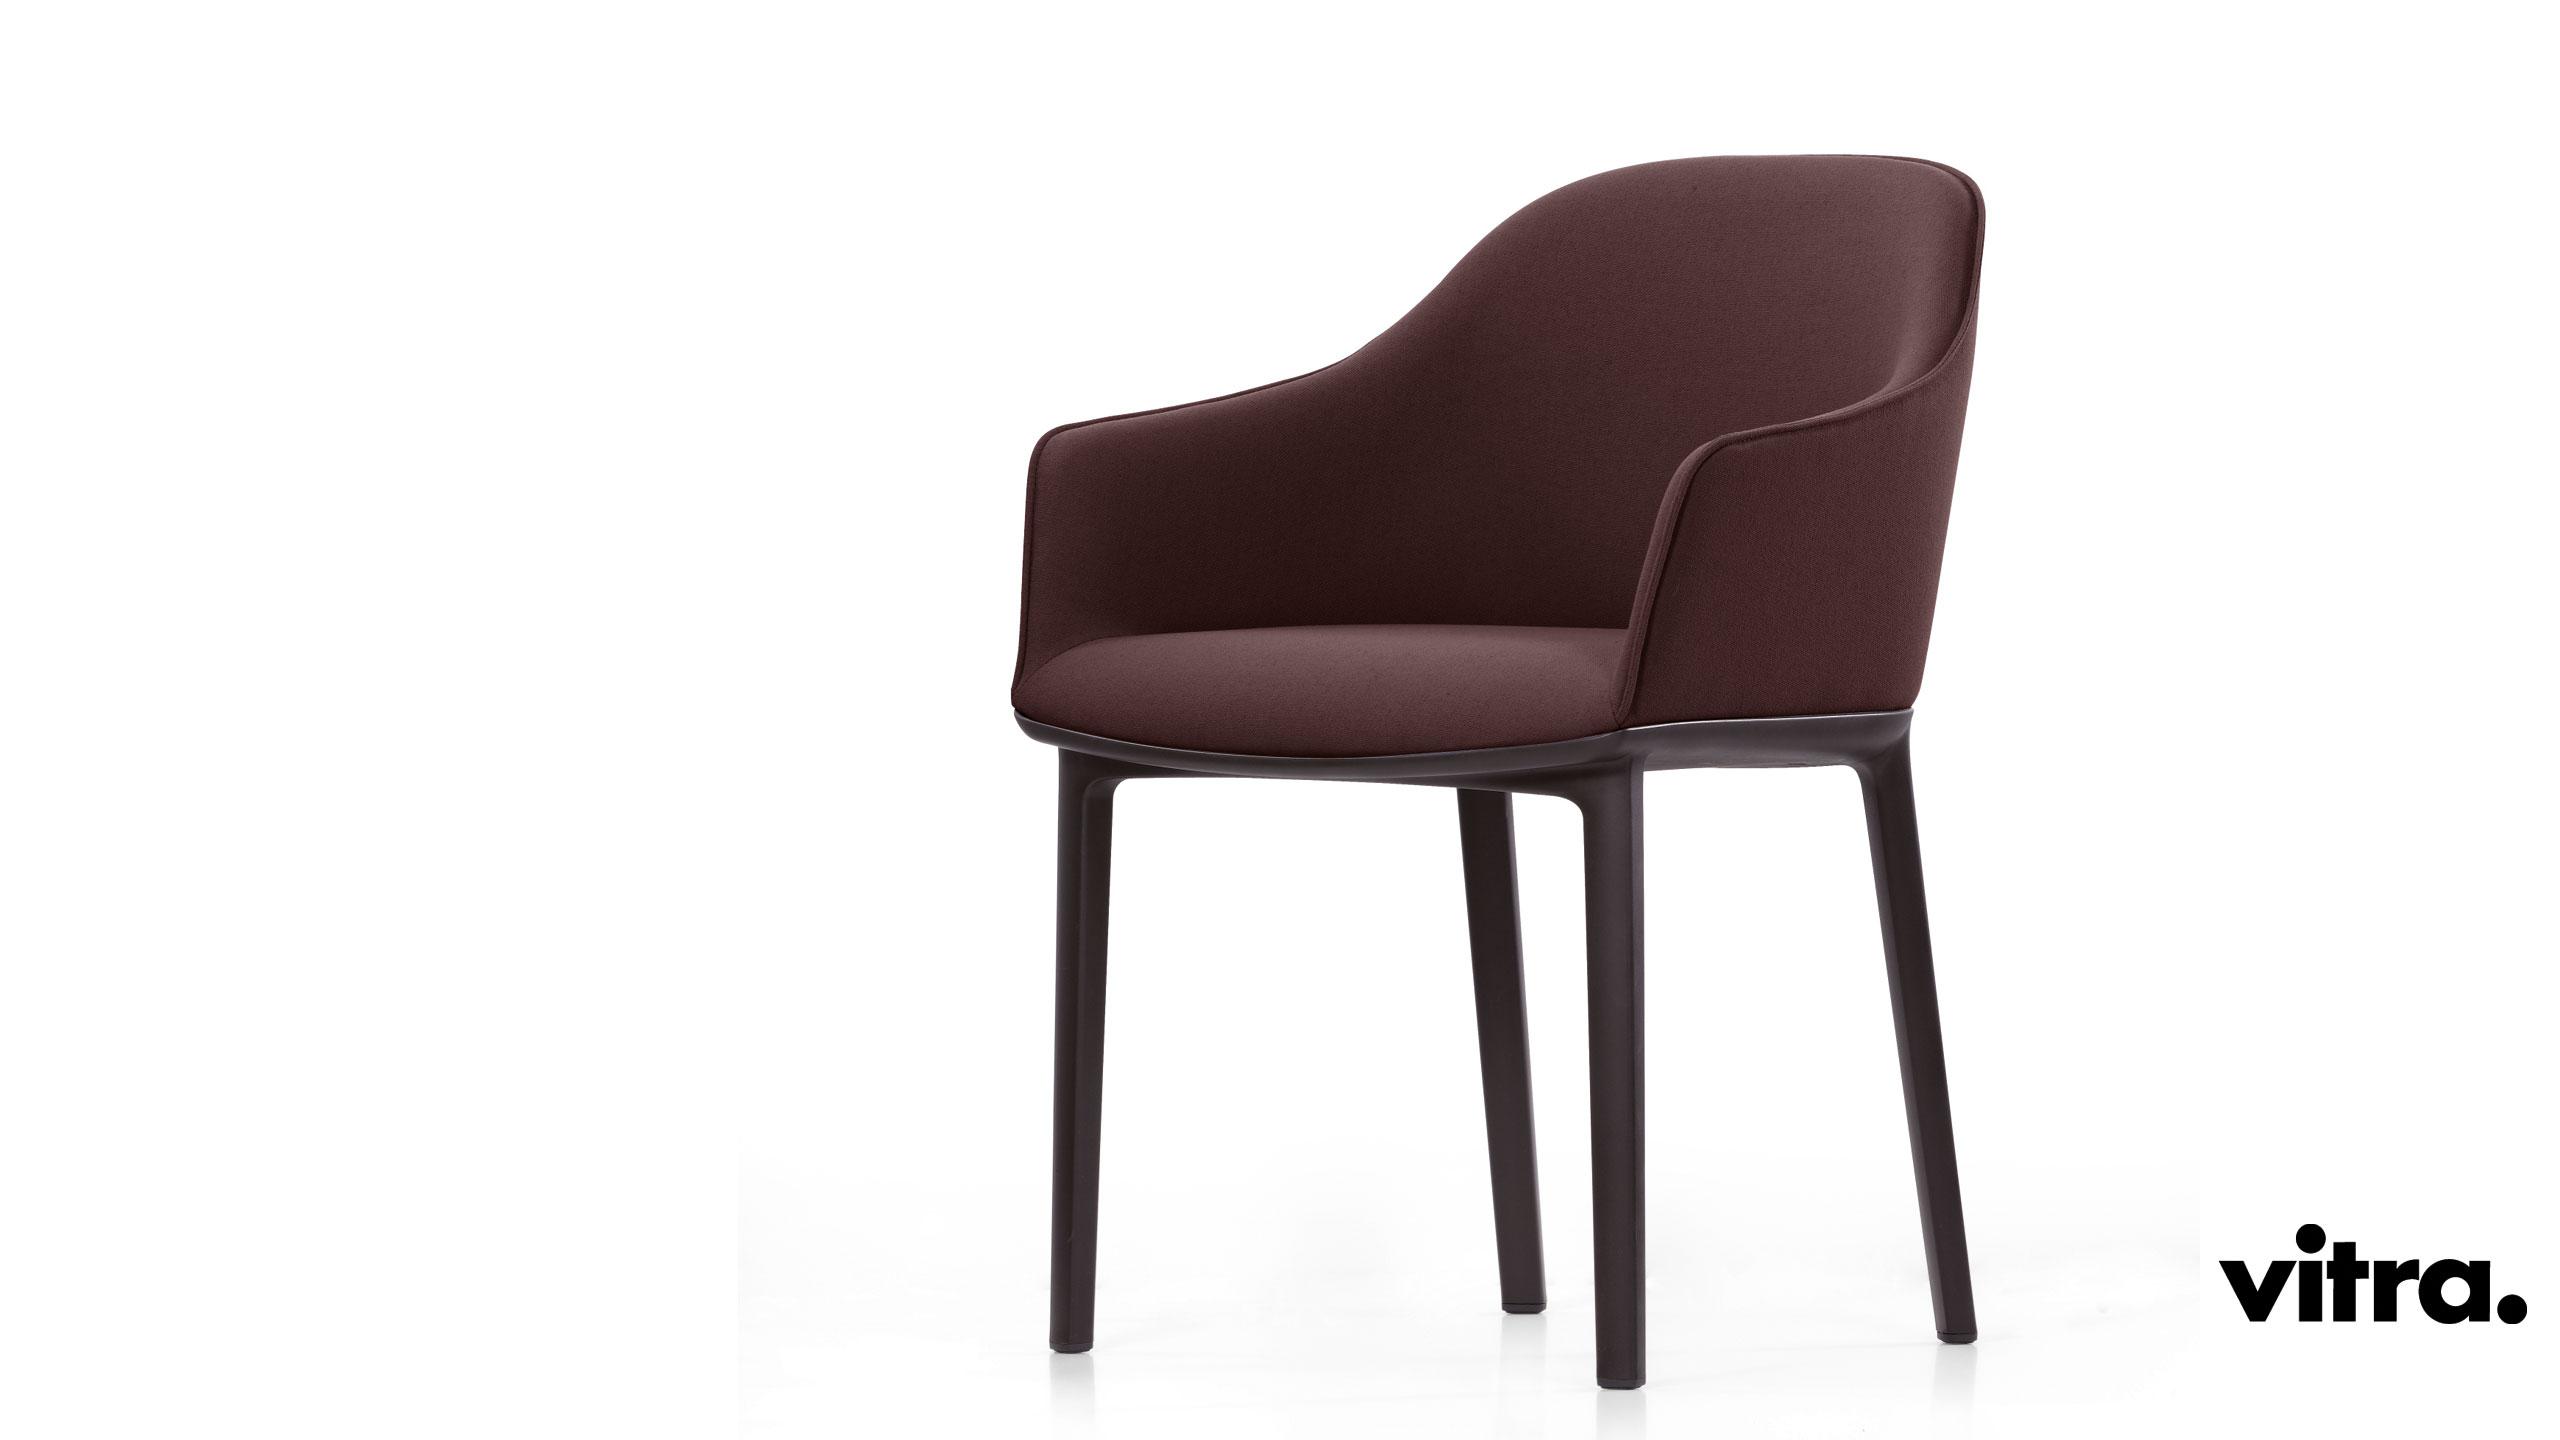 vitra softshell chair jetzt bei m bel braum in bad homburg shoppen. Black Bedroom Furniture Sets. Home Design Ideas